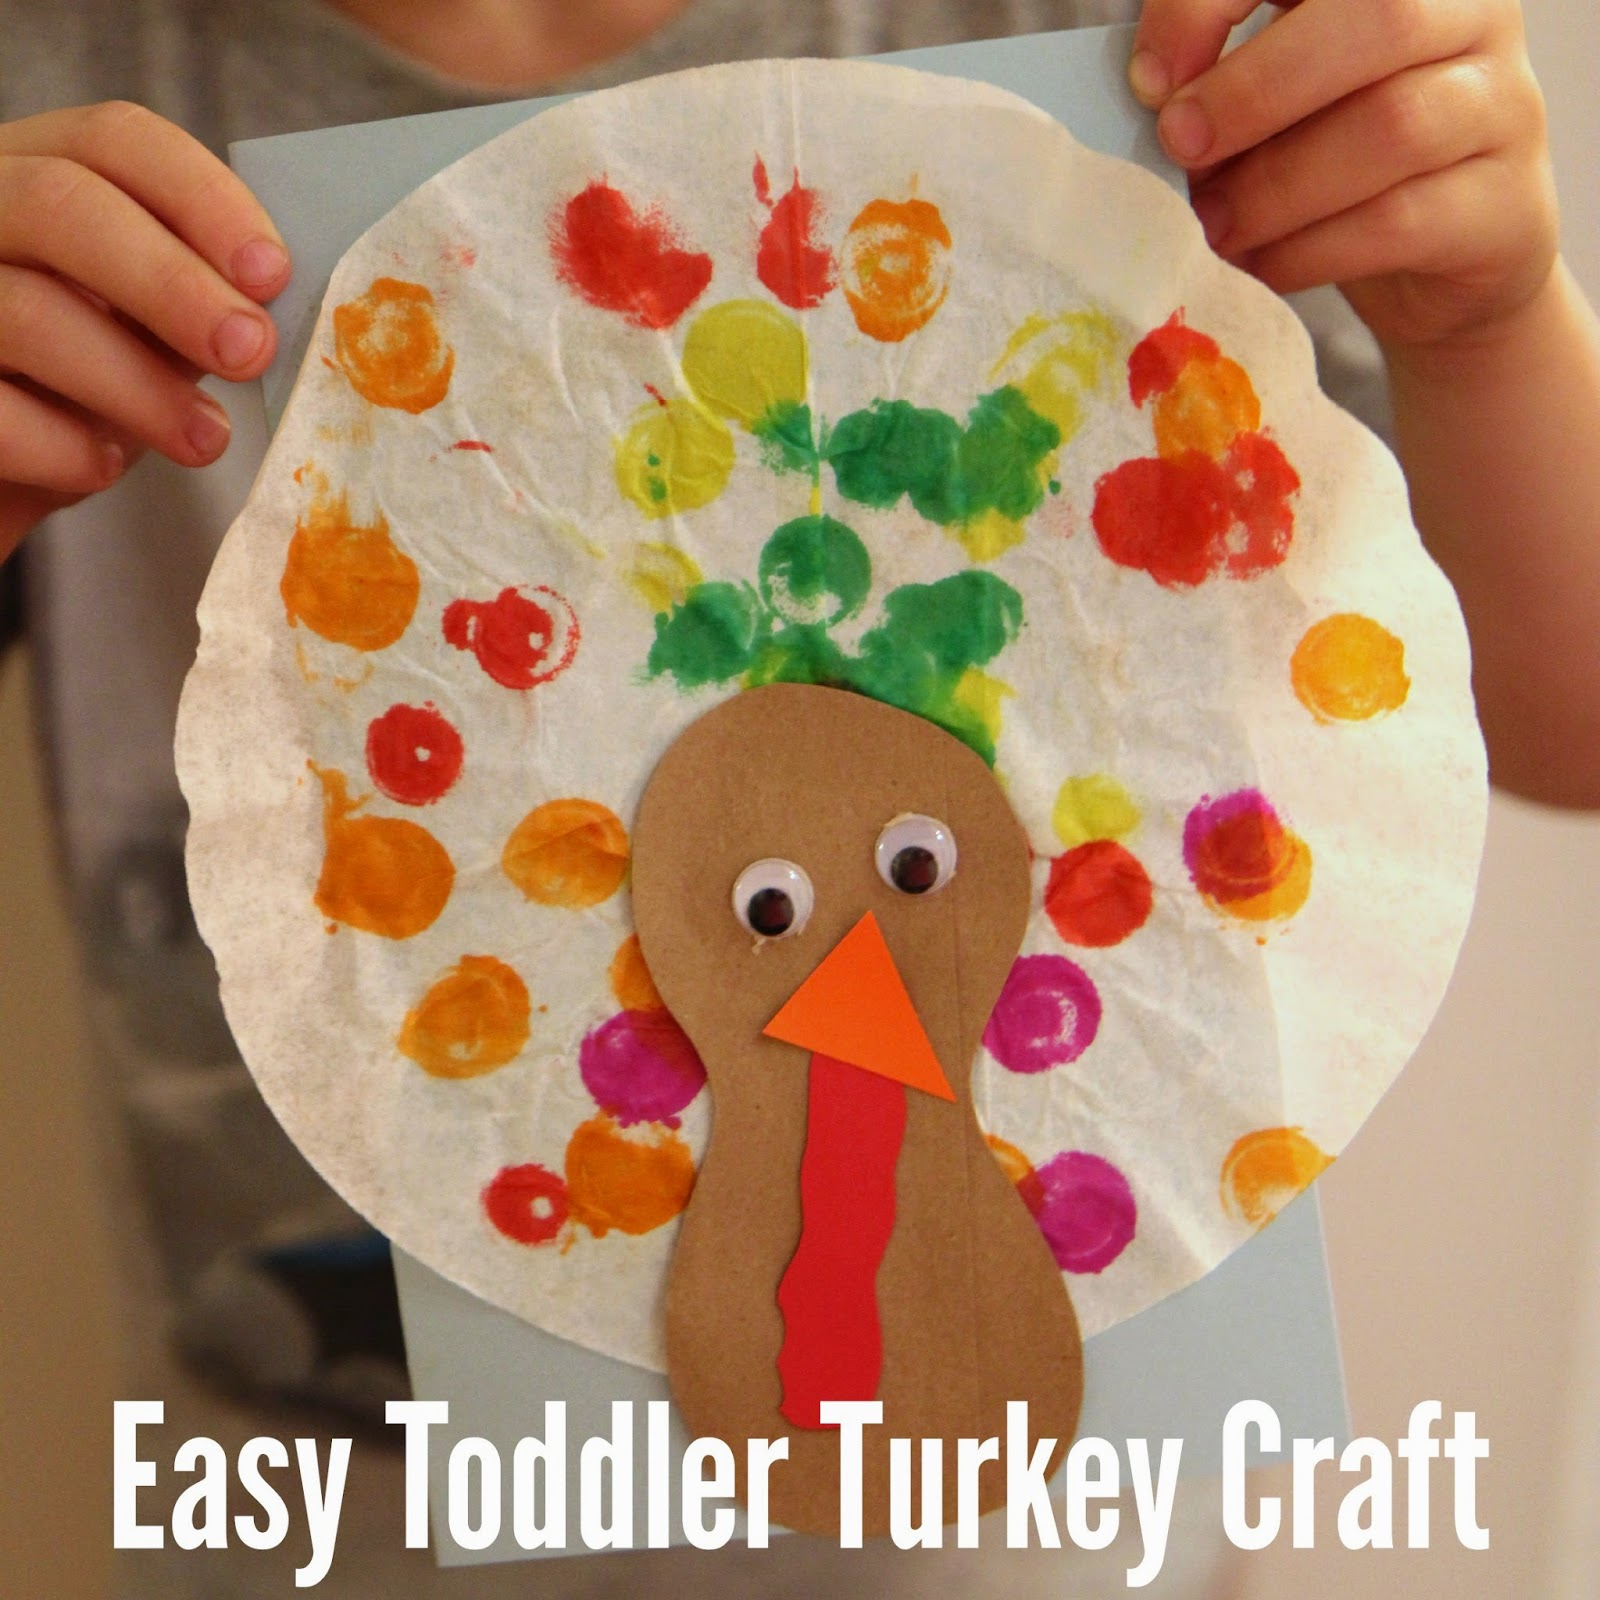 Preschool Turkey Craft Using Shapes